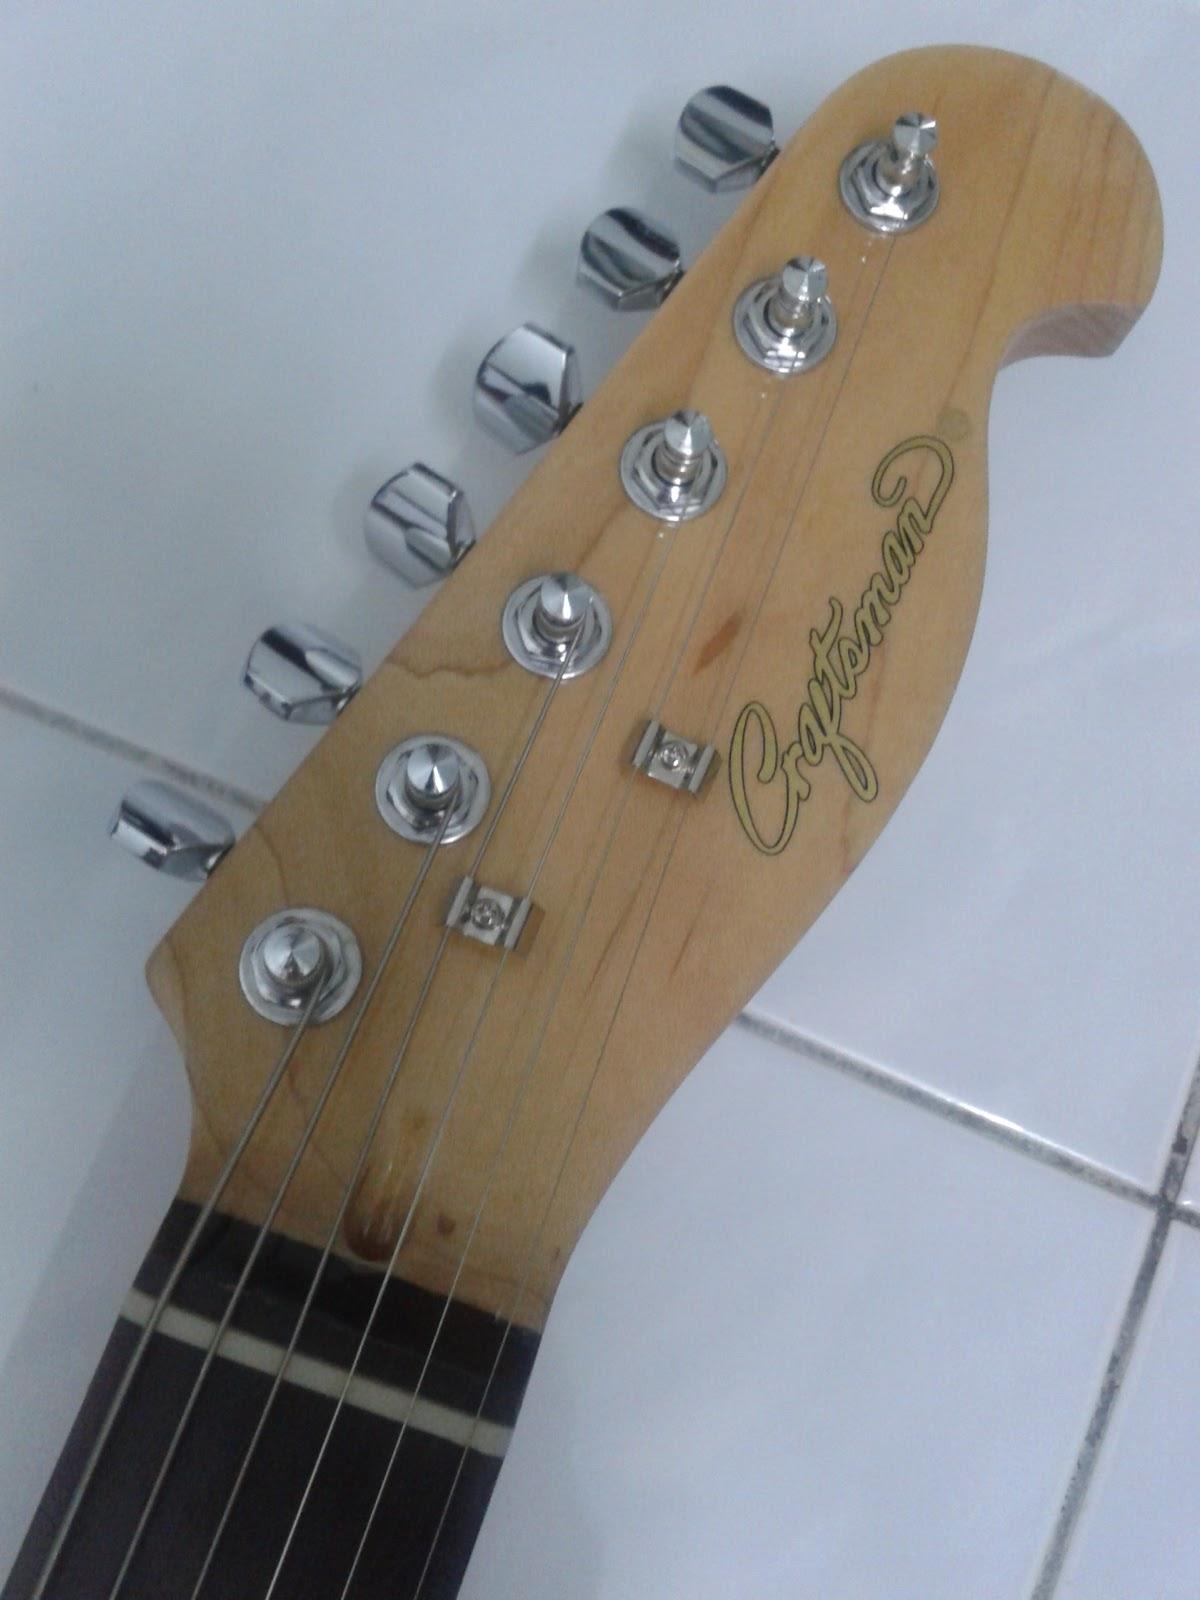 drcl music craftsman tl50 telecaster electric guitar. Black Bedroom Furniture Sets. Home Design Ideas